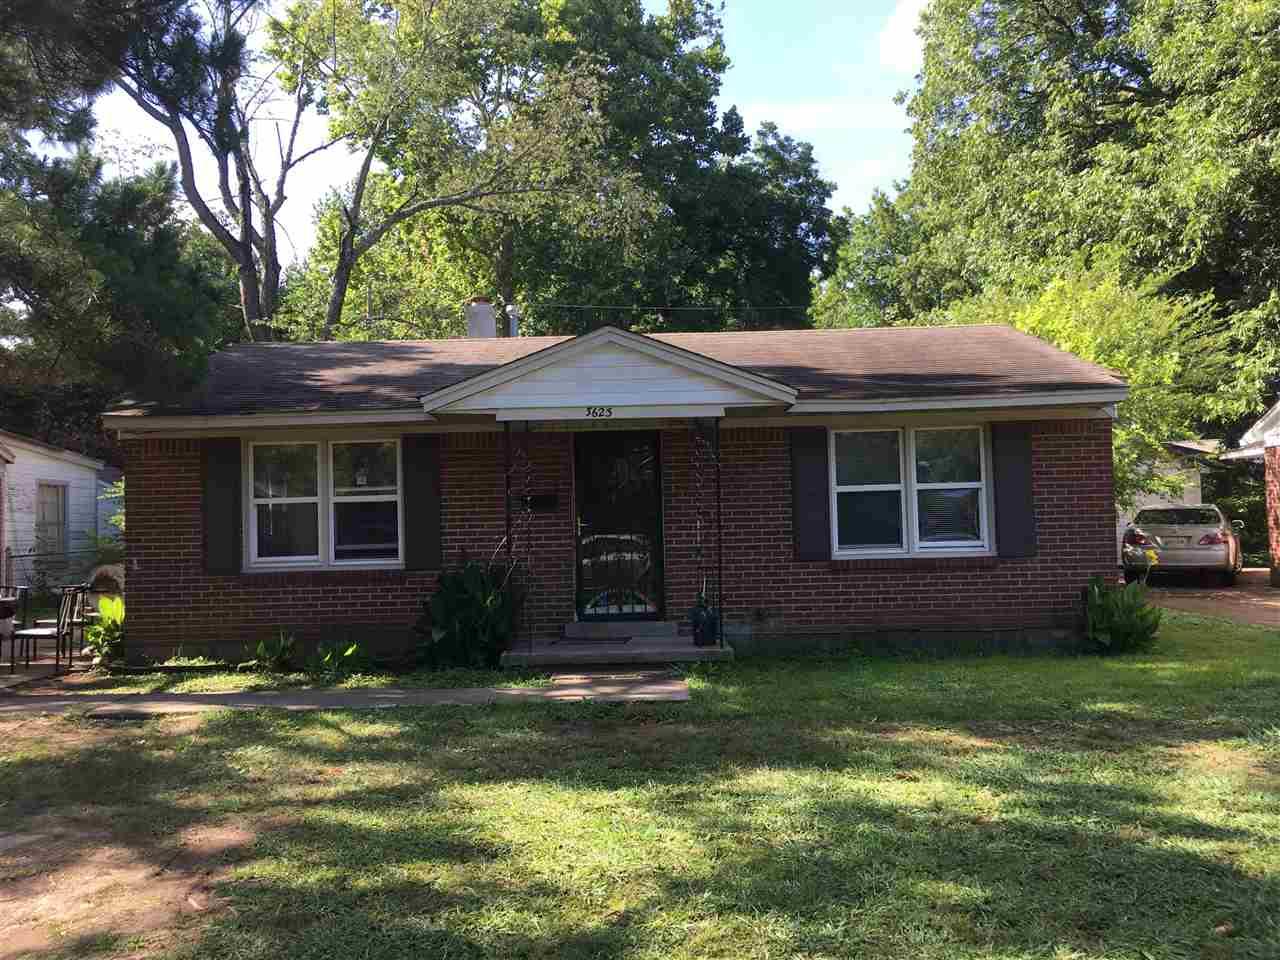 3623 Sharpe Memphis, TN 38111 - MLS #: 10005108